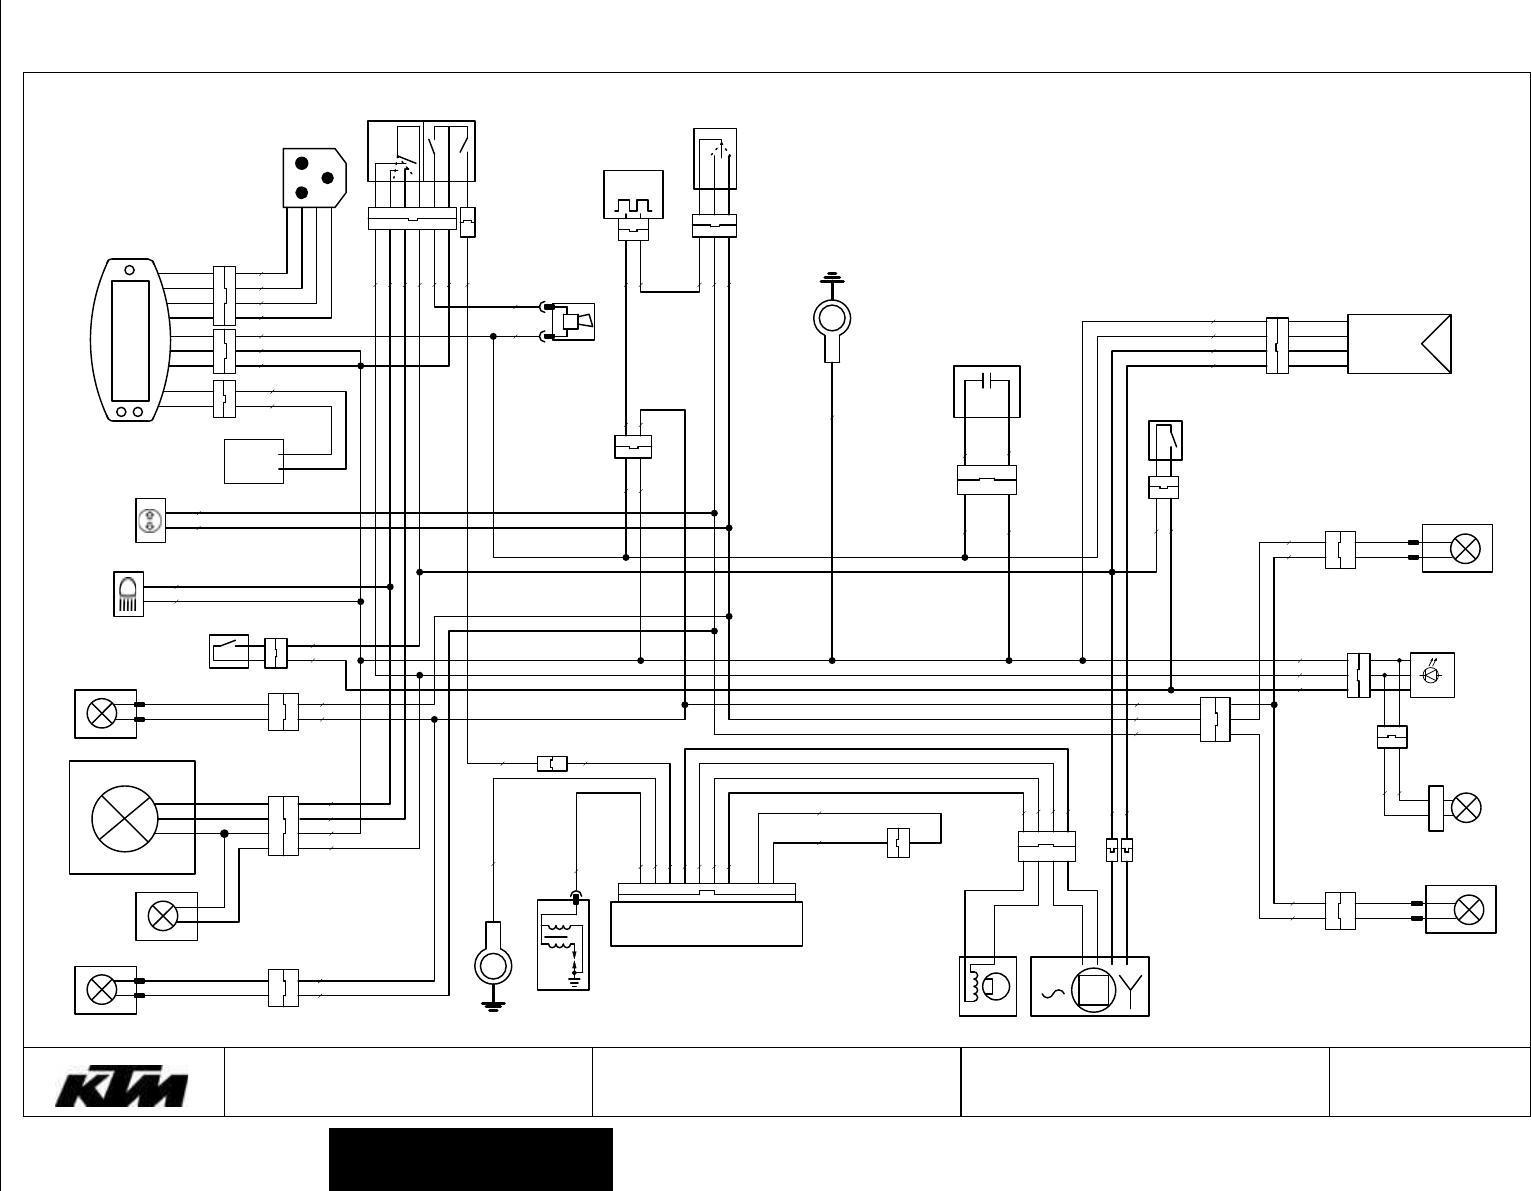 2013 Ktm 450 Xc W Wiring Diagram - 99 Audi A6 Wiring Light for Wiring  Diagram Schematics | 99 Ktm Wiring Diagram |  | Wiring Diagram Schematics